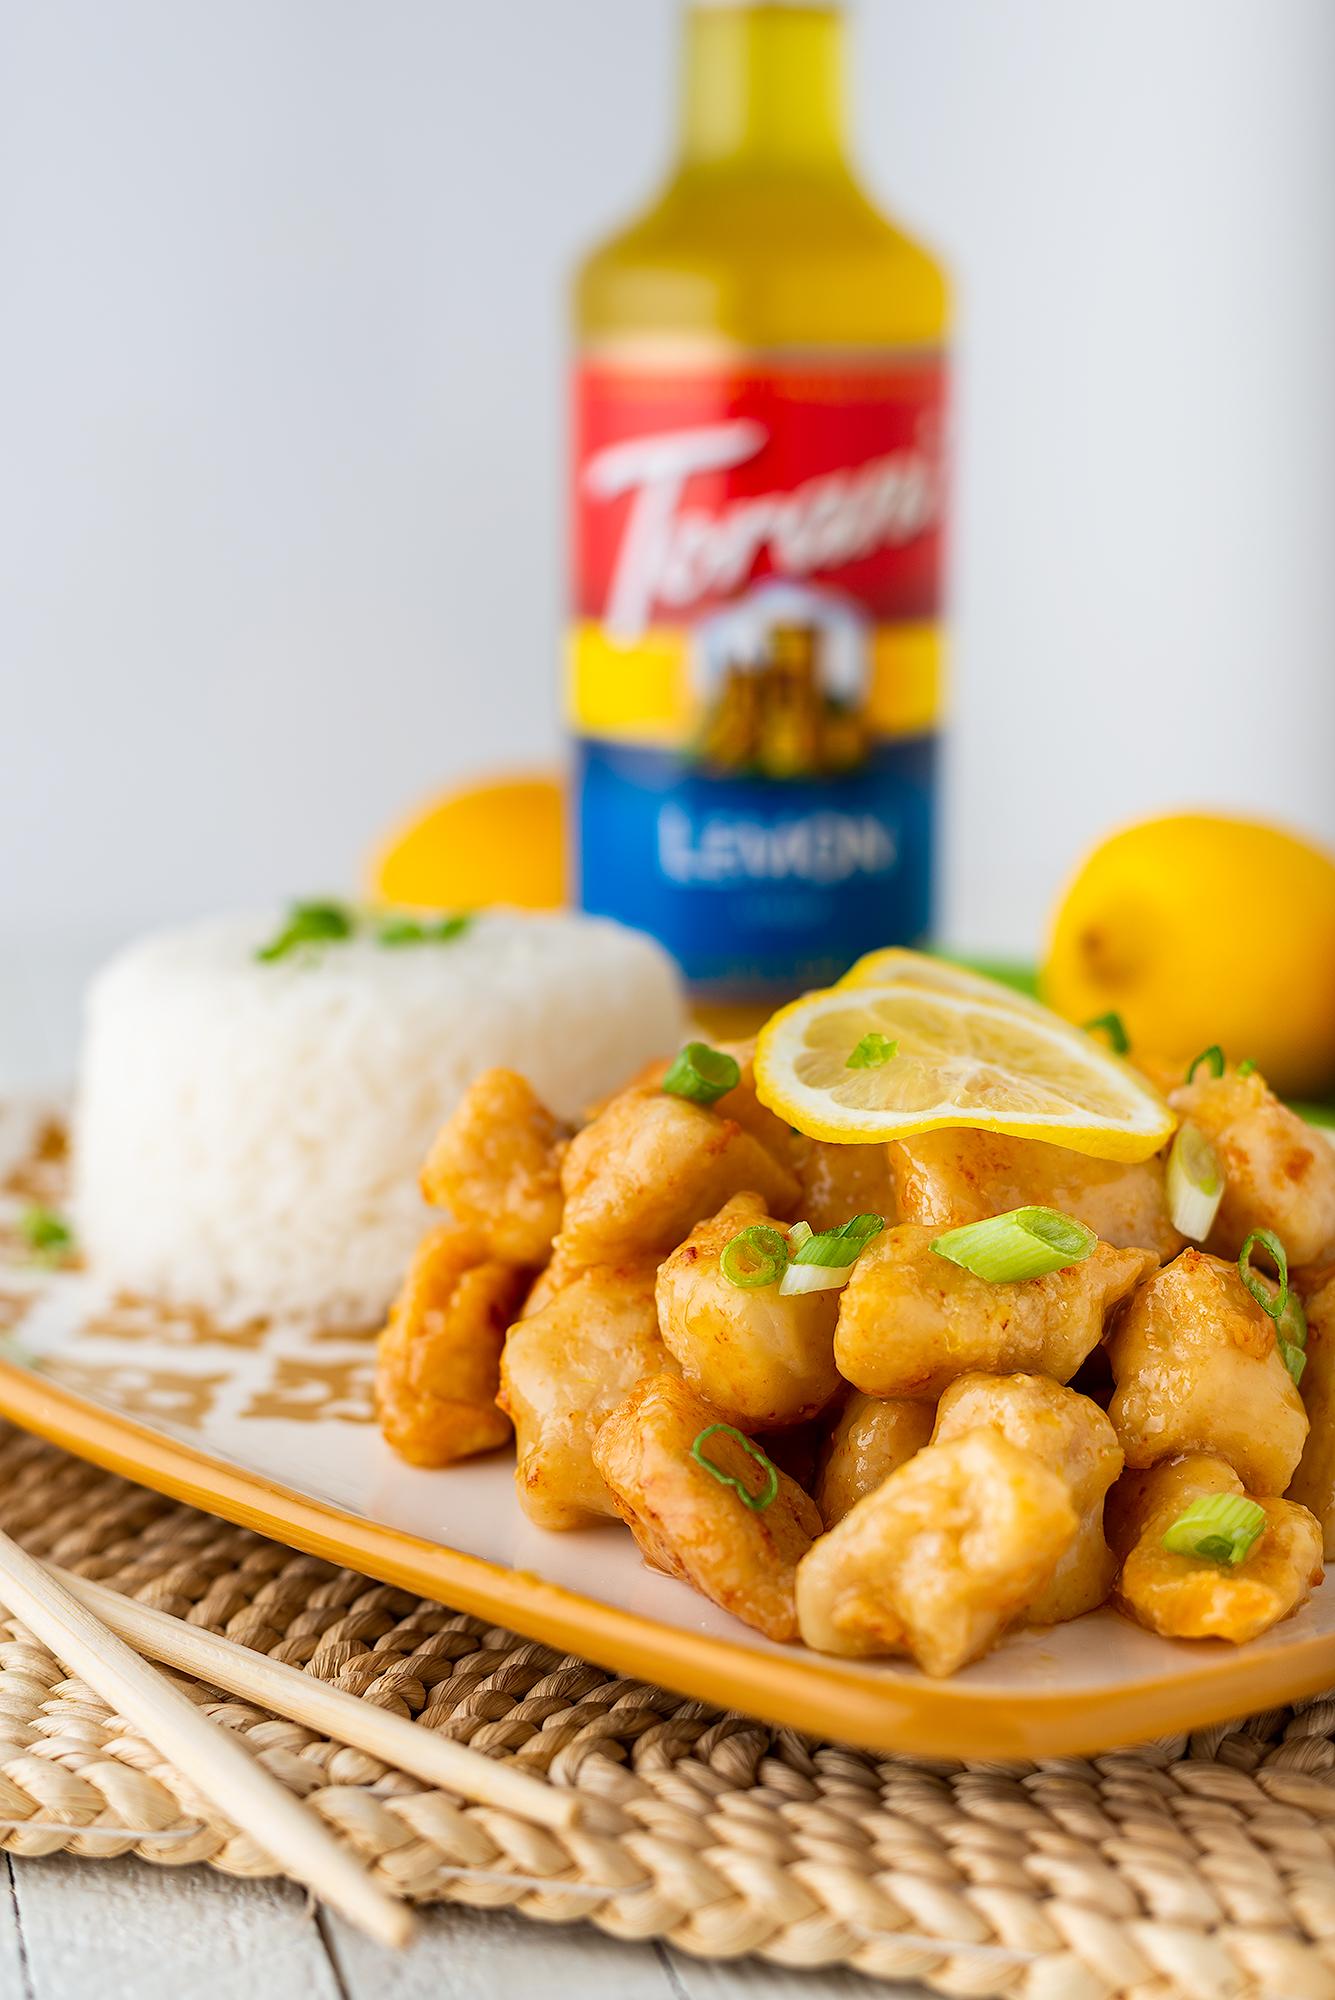 Torani Lemon Chicken Vertical